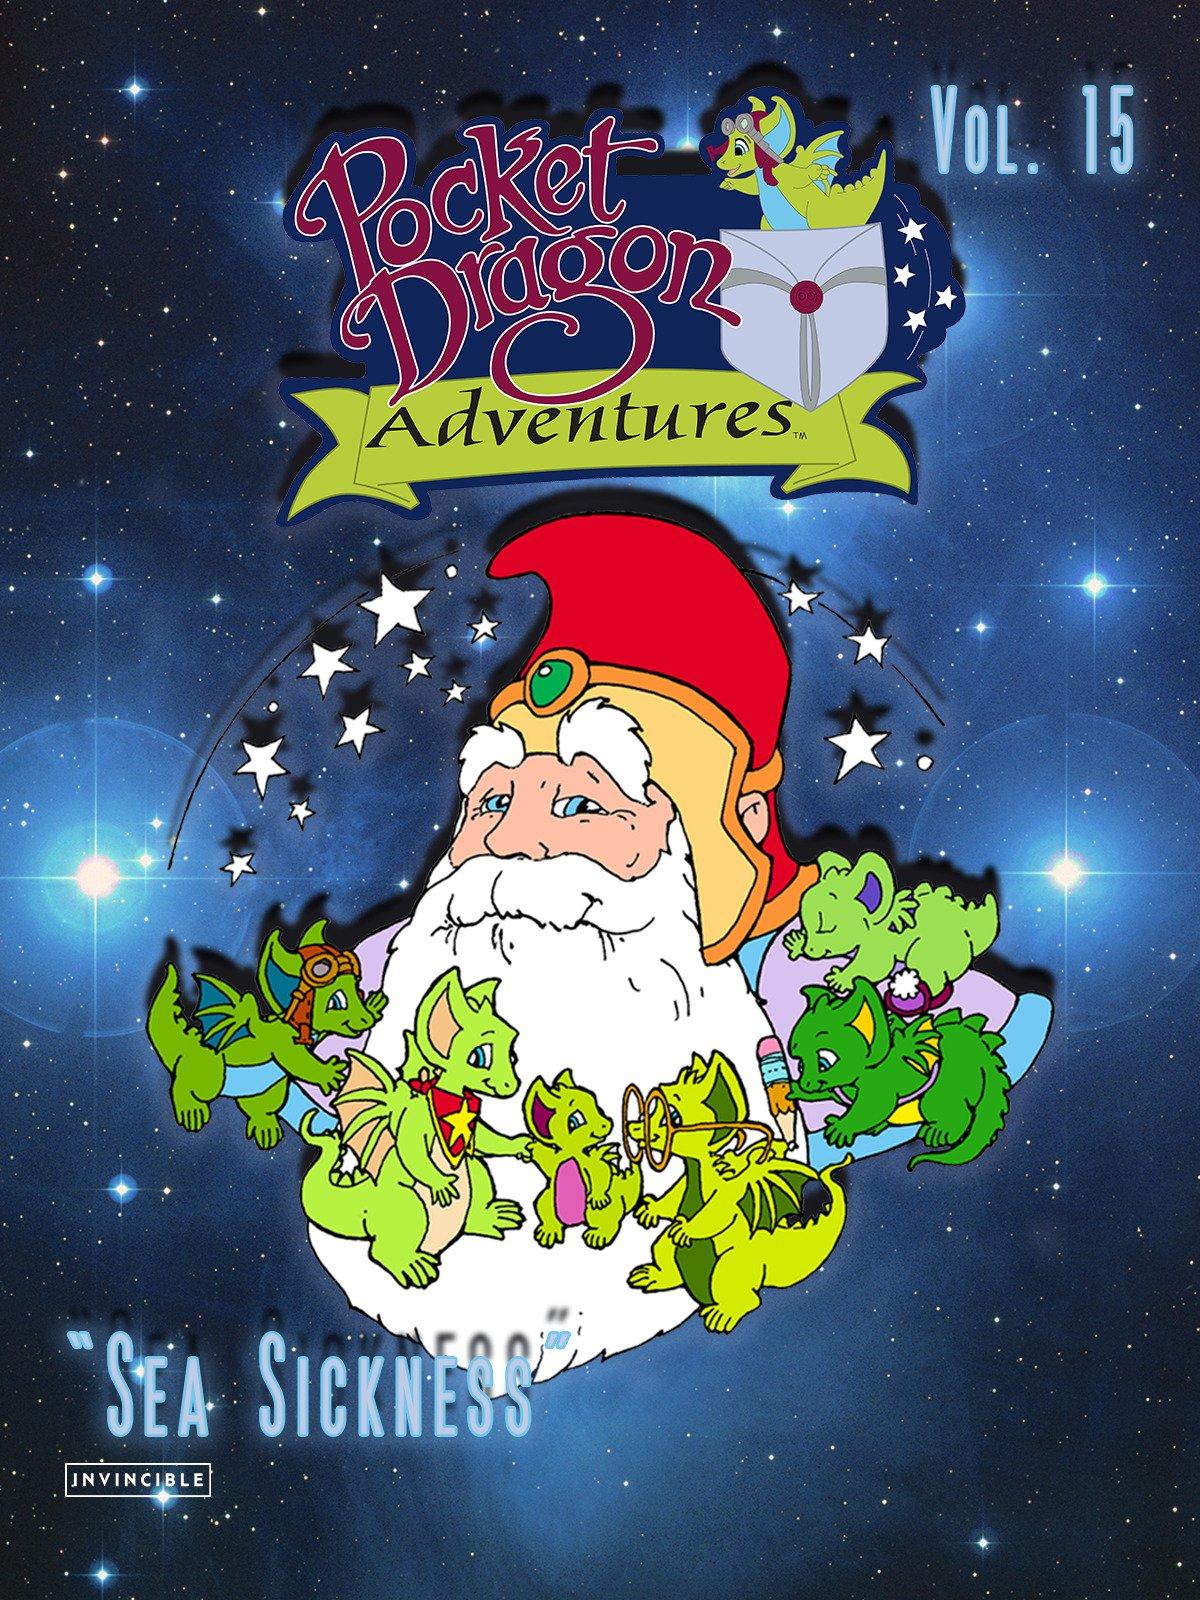 Pocket Dragon Adventures Vol. 15Sea Sickness